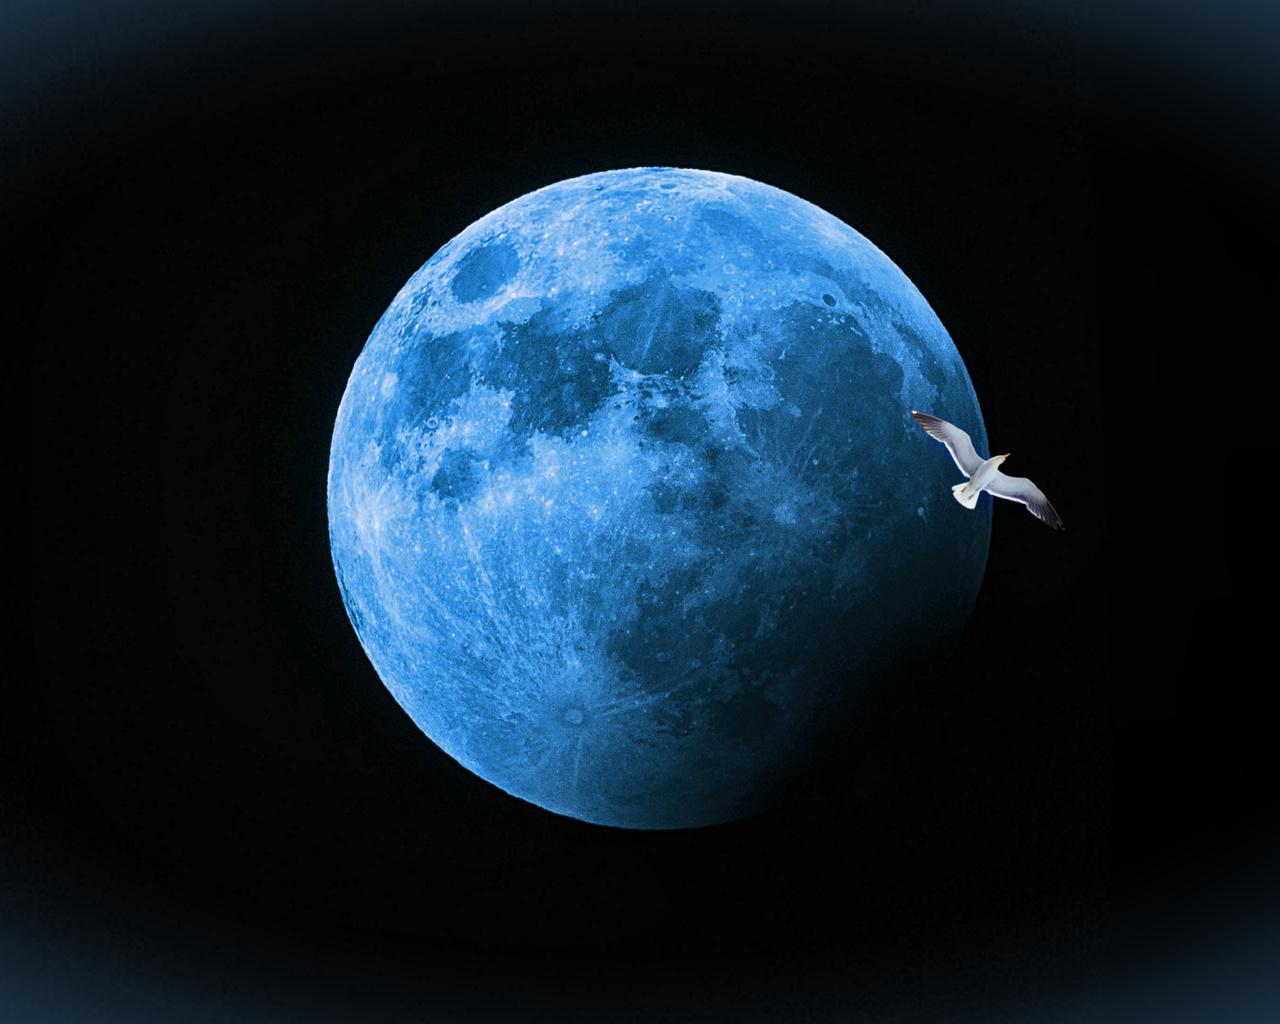 луна, чайка, фон